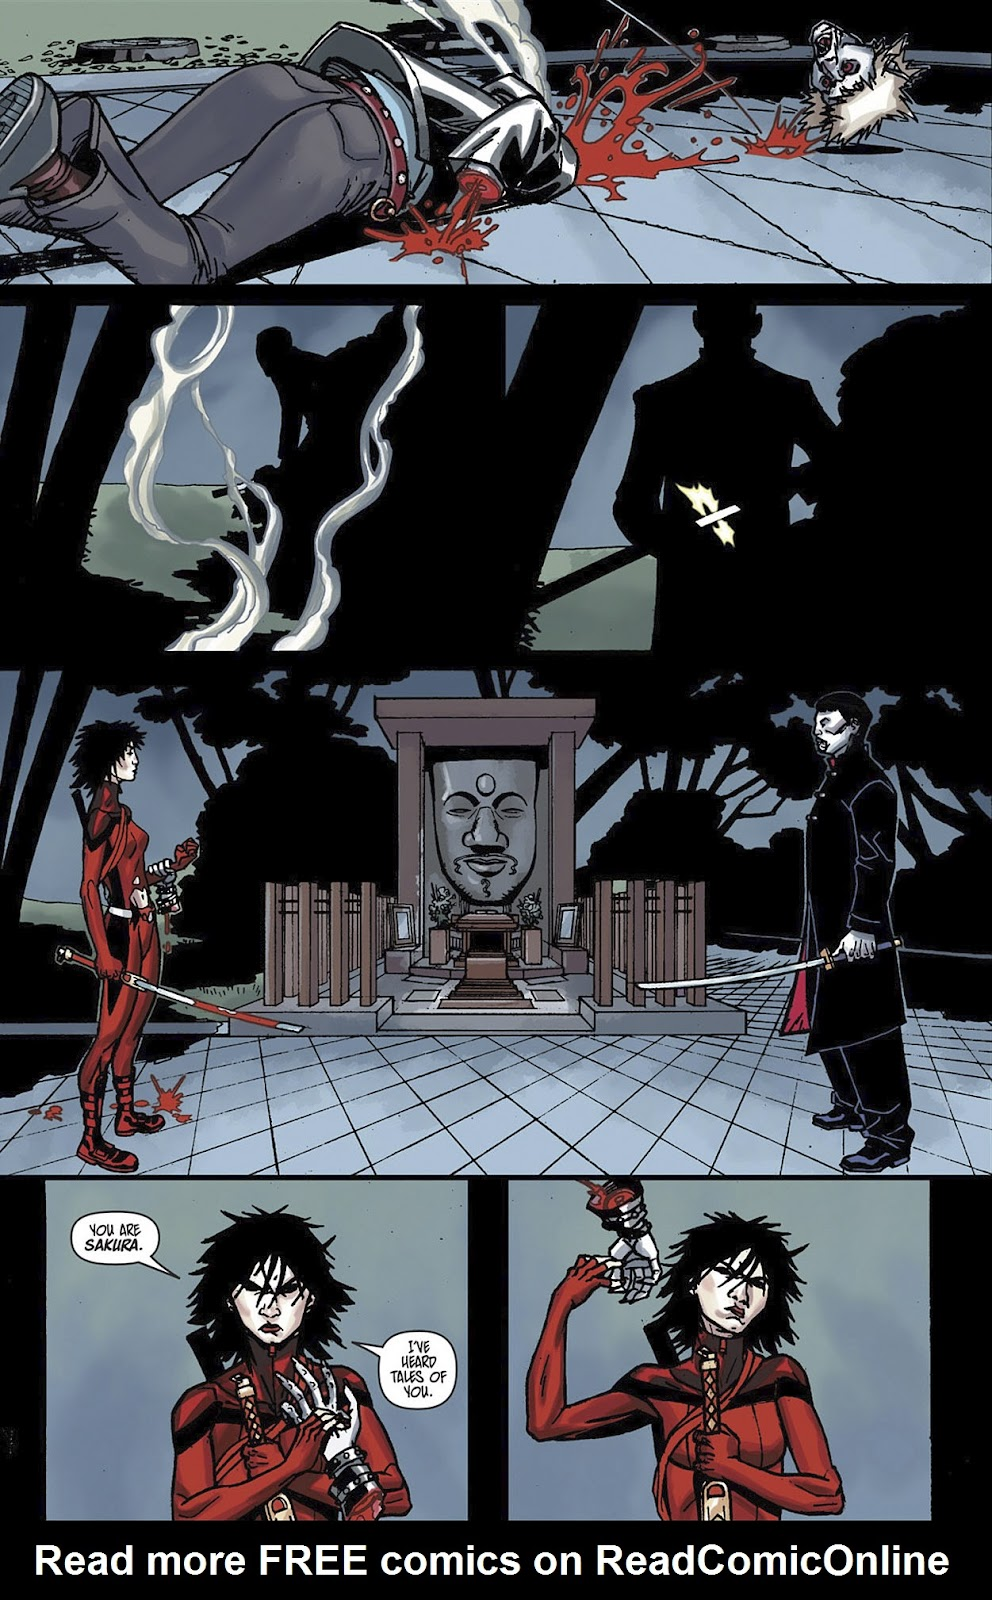 Read online Shinku comic -  Issue #3 - 21